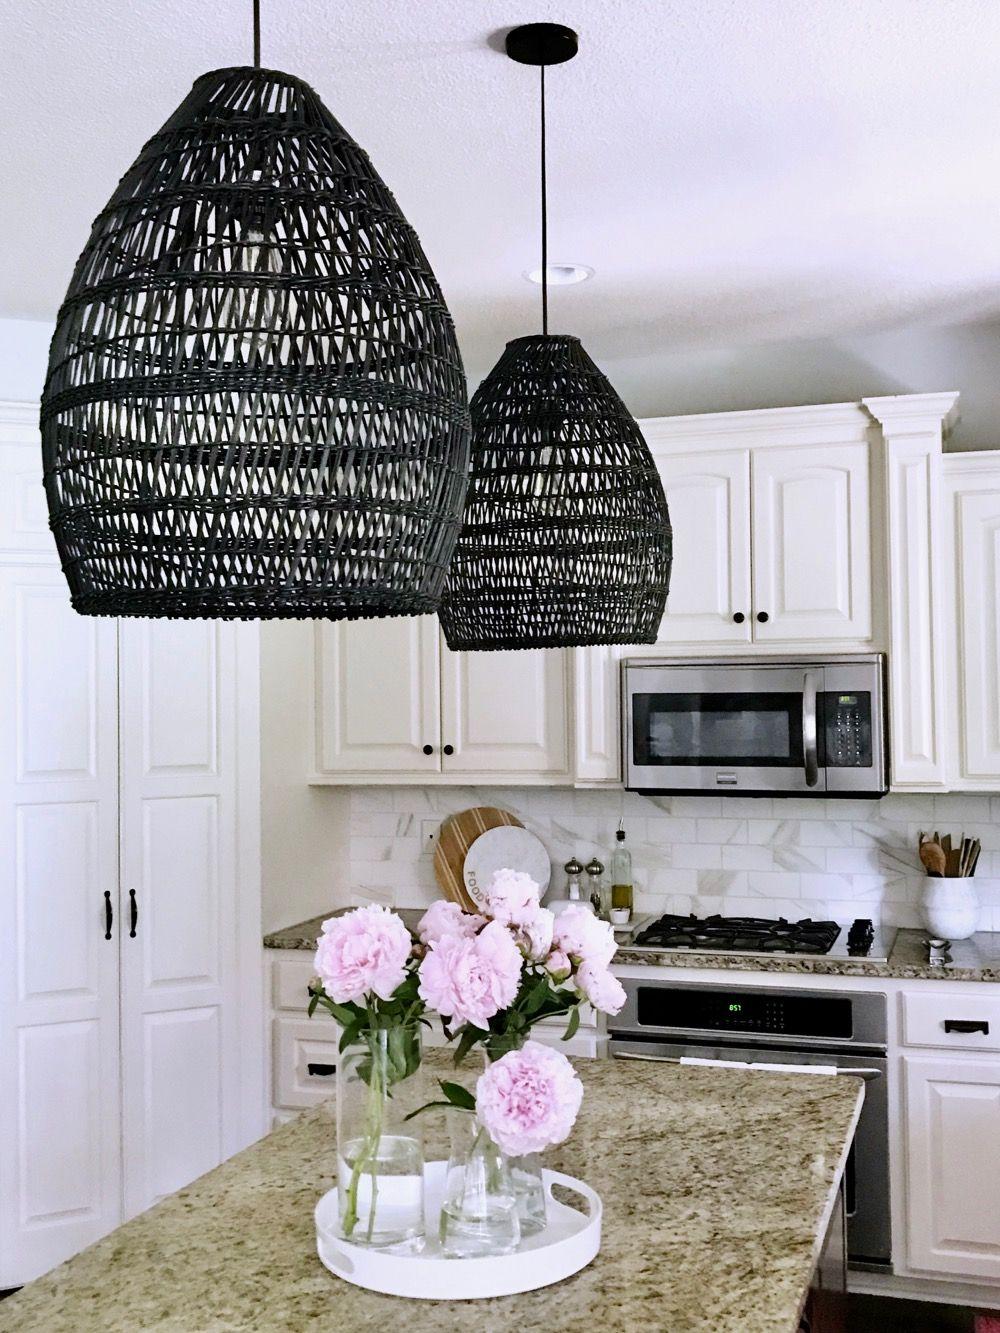 Black Woven Pendant Lights Pendant Lighting Lights Kitchen Pendant Lighting